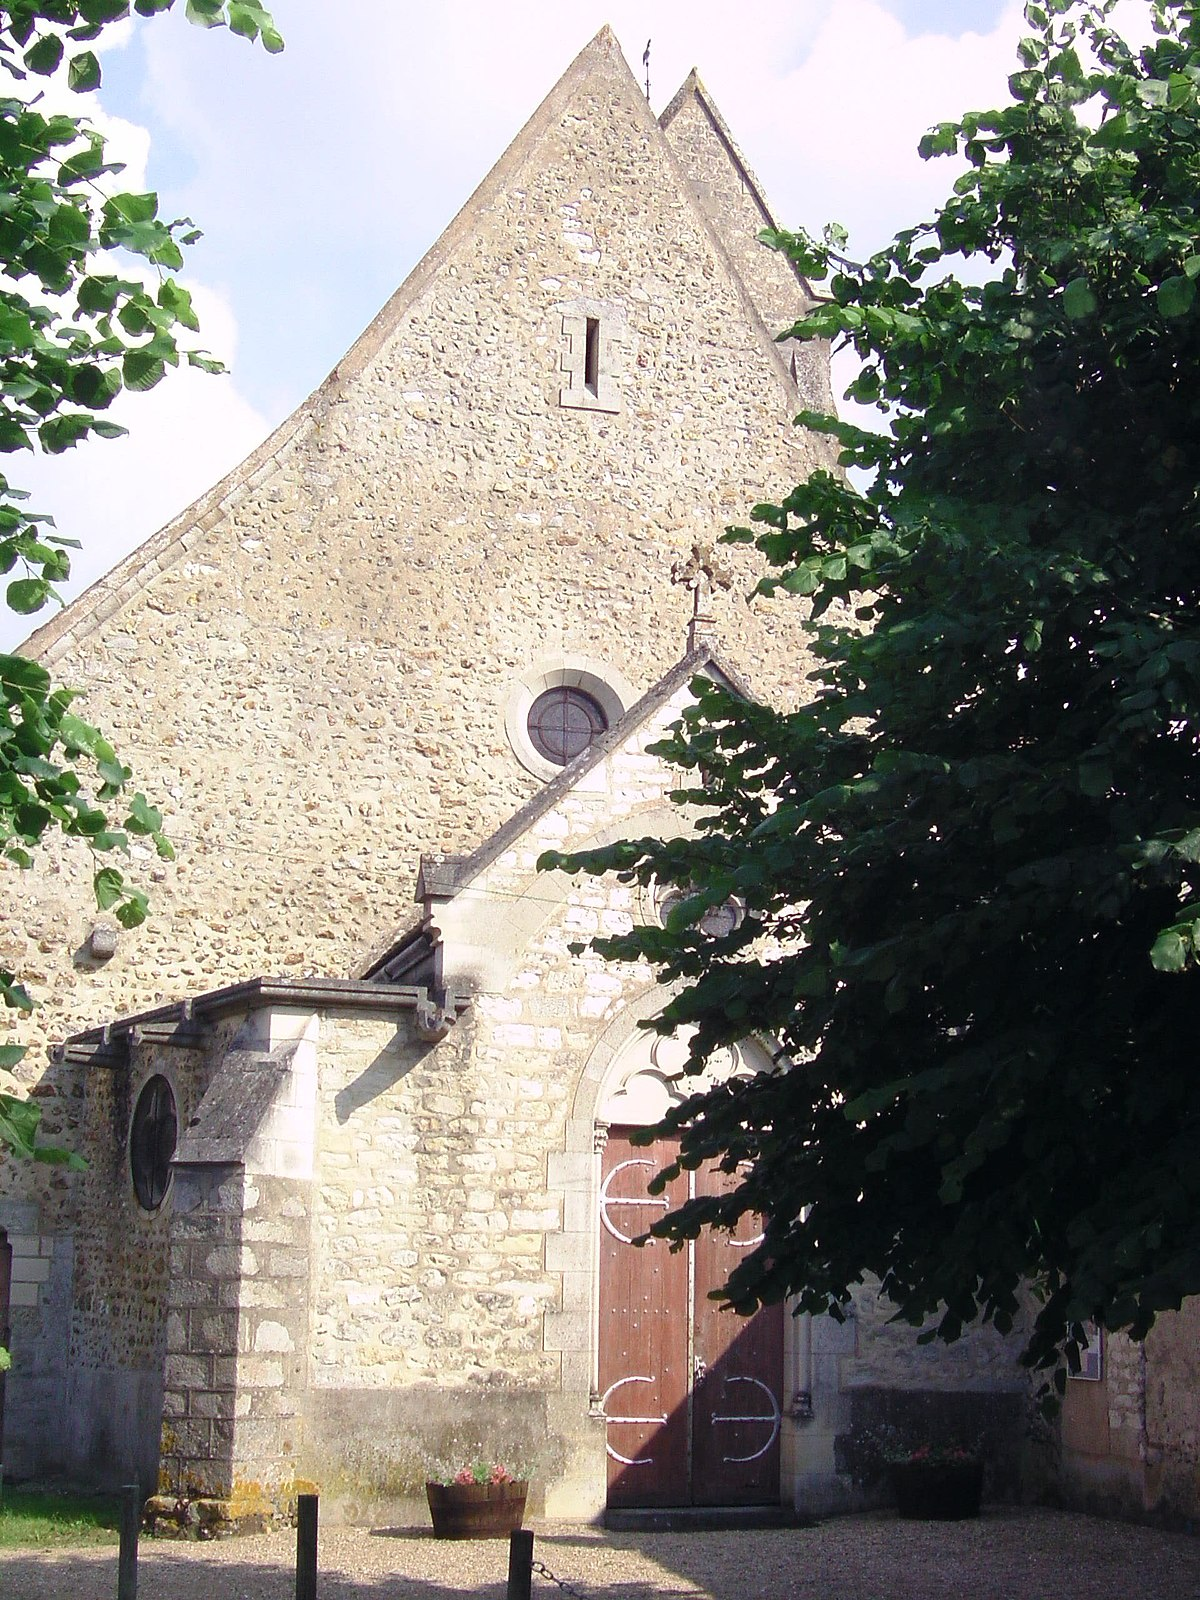 Glise saint aubin de saint aubin sur yonne wikip dia - La petite cheminee saint aubin ...